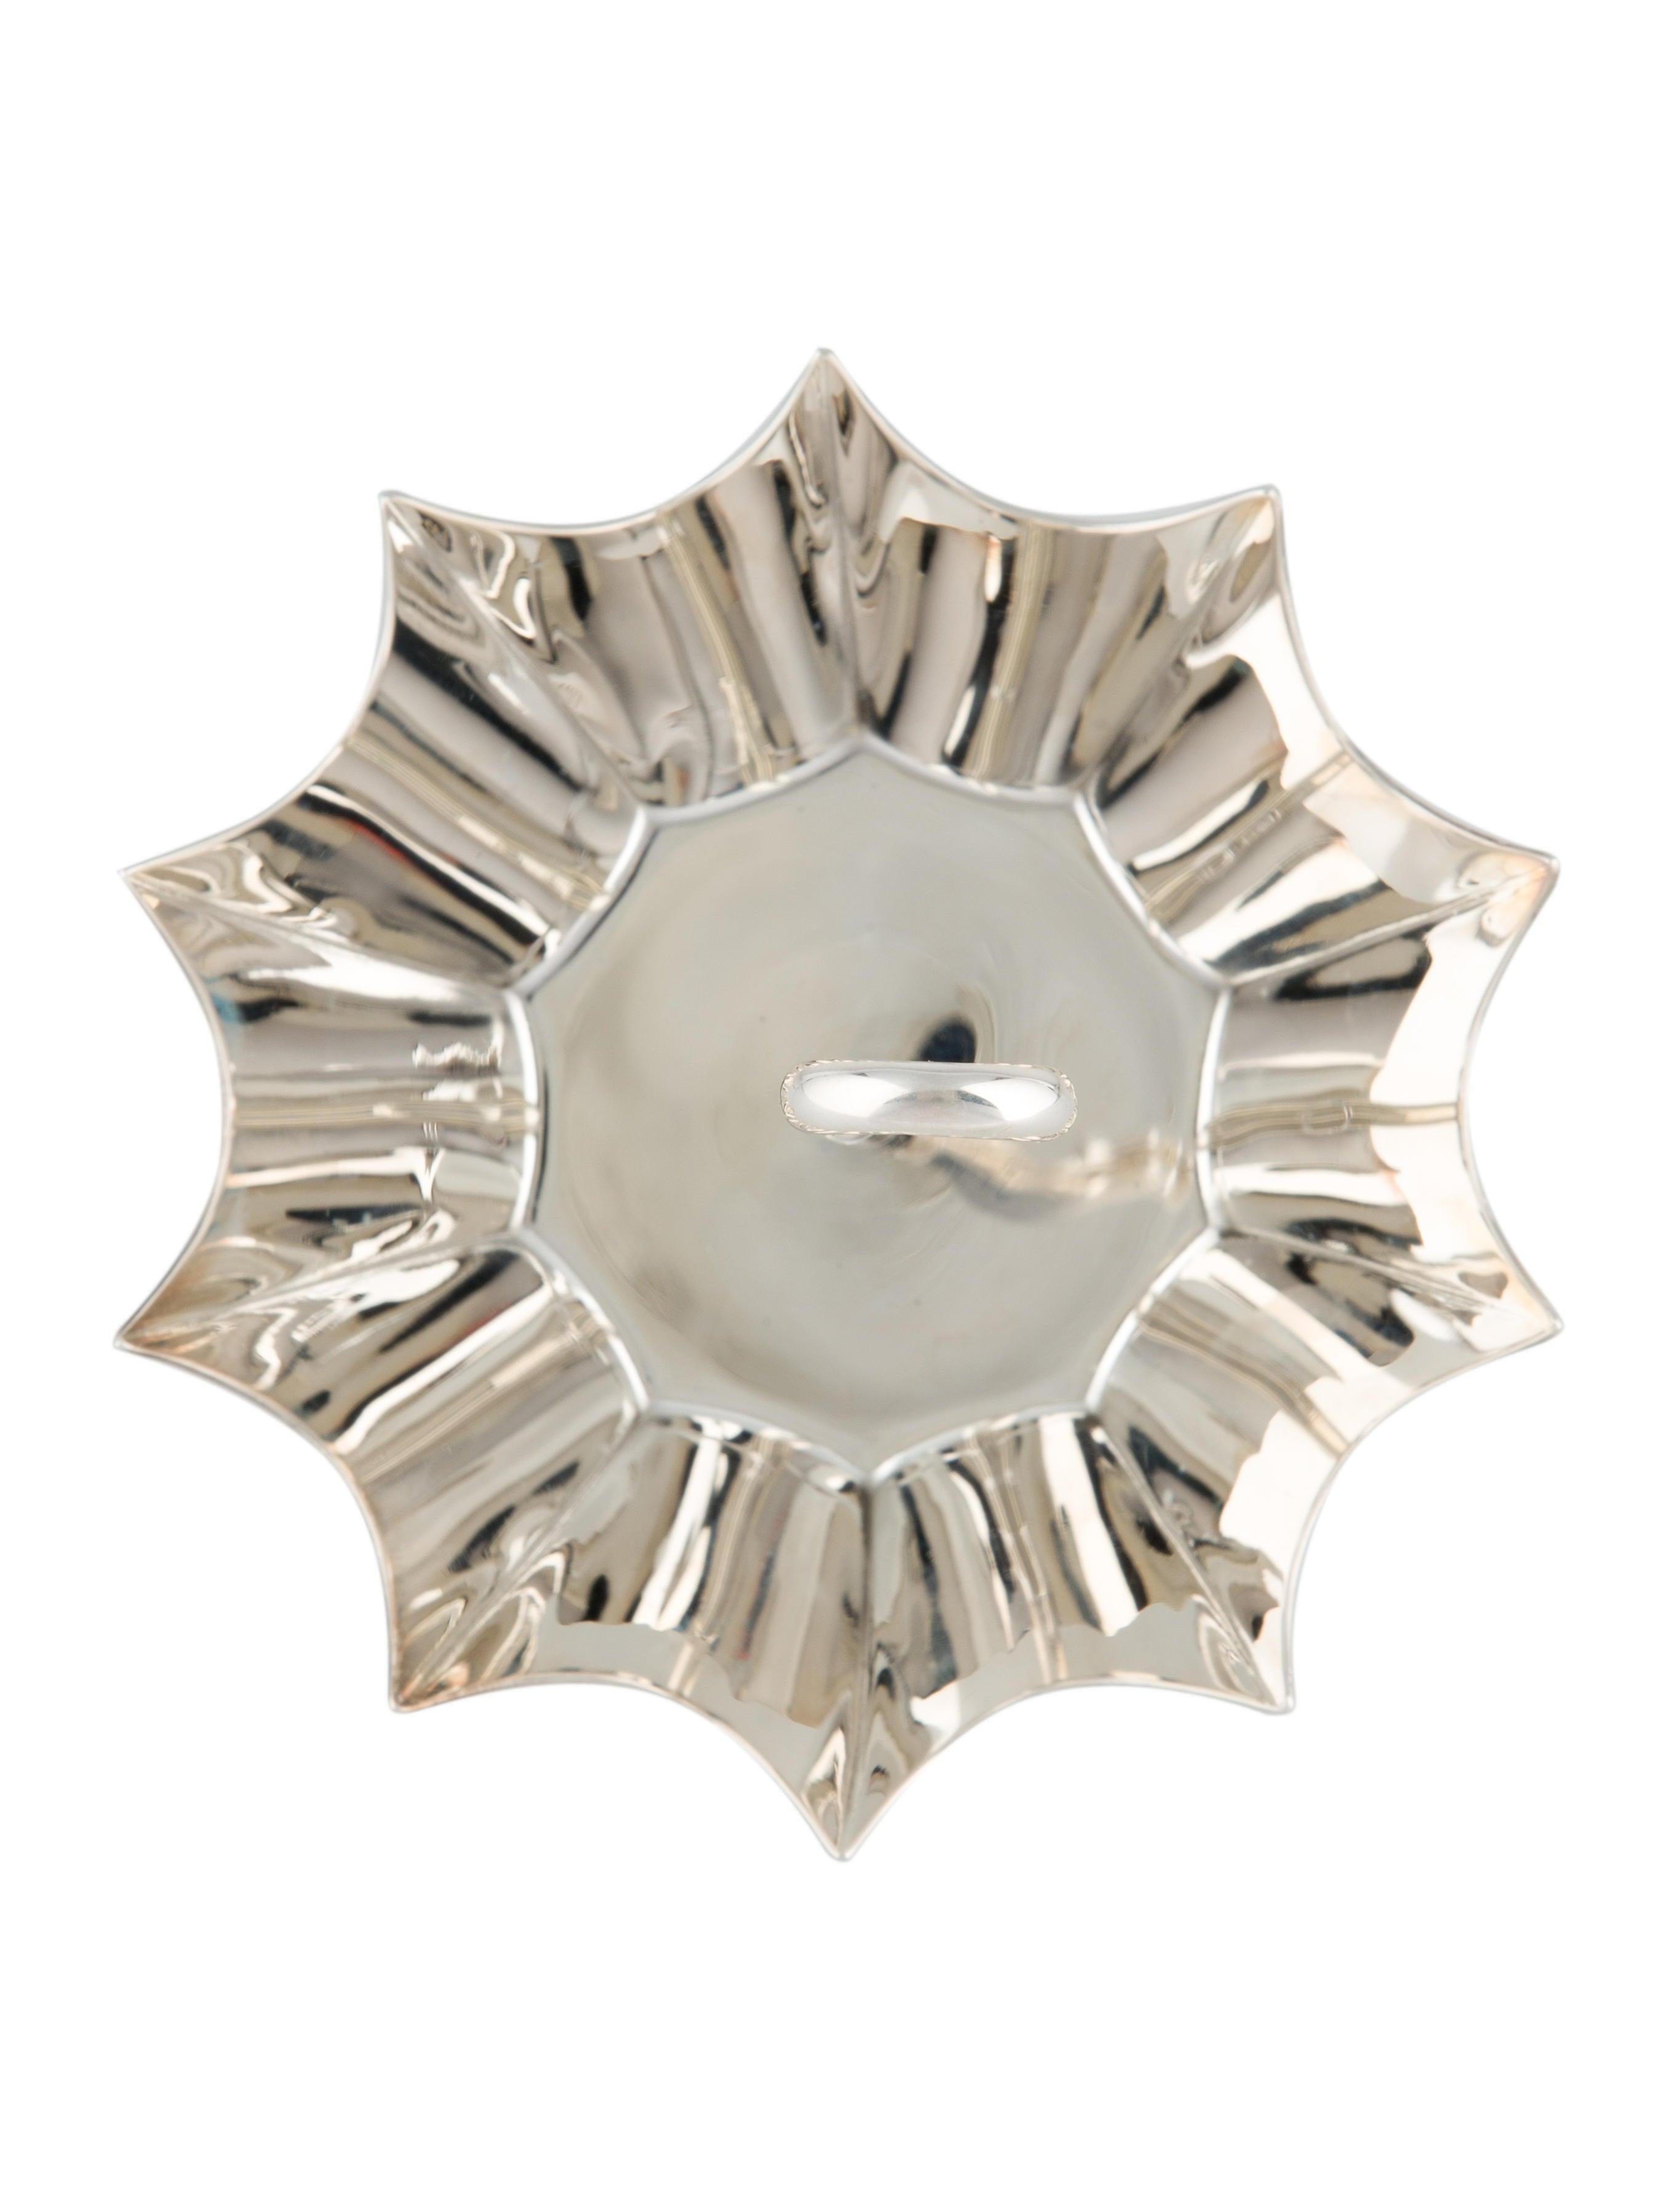 Tiffany co umbrella dish in sterling silver decor and for Artistic accents genuine silver decoration